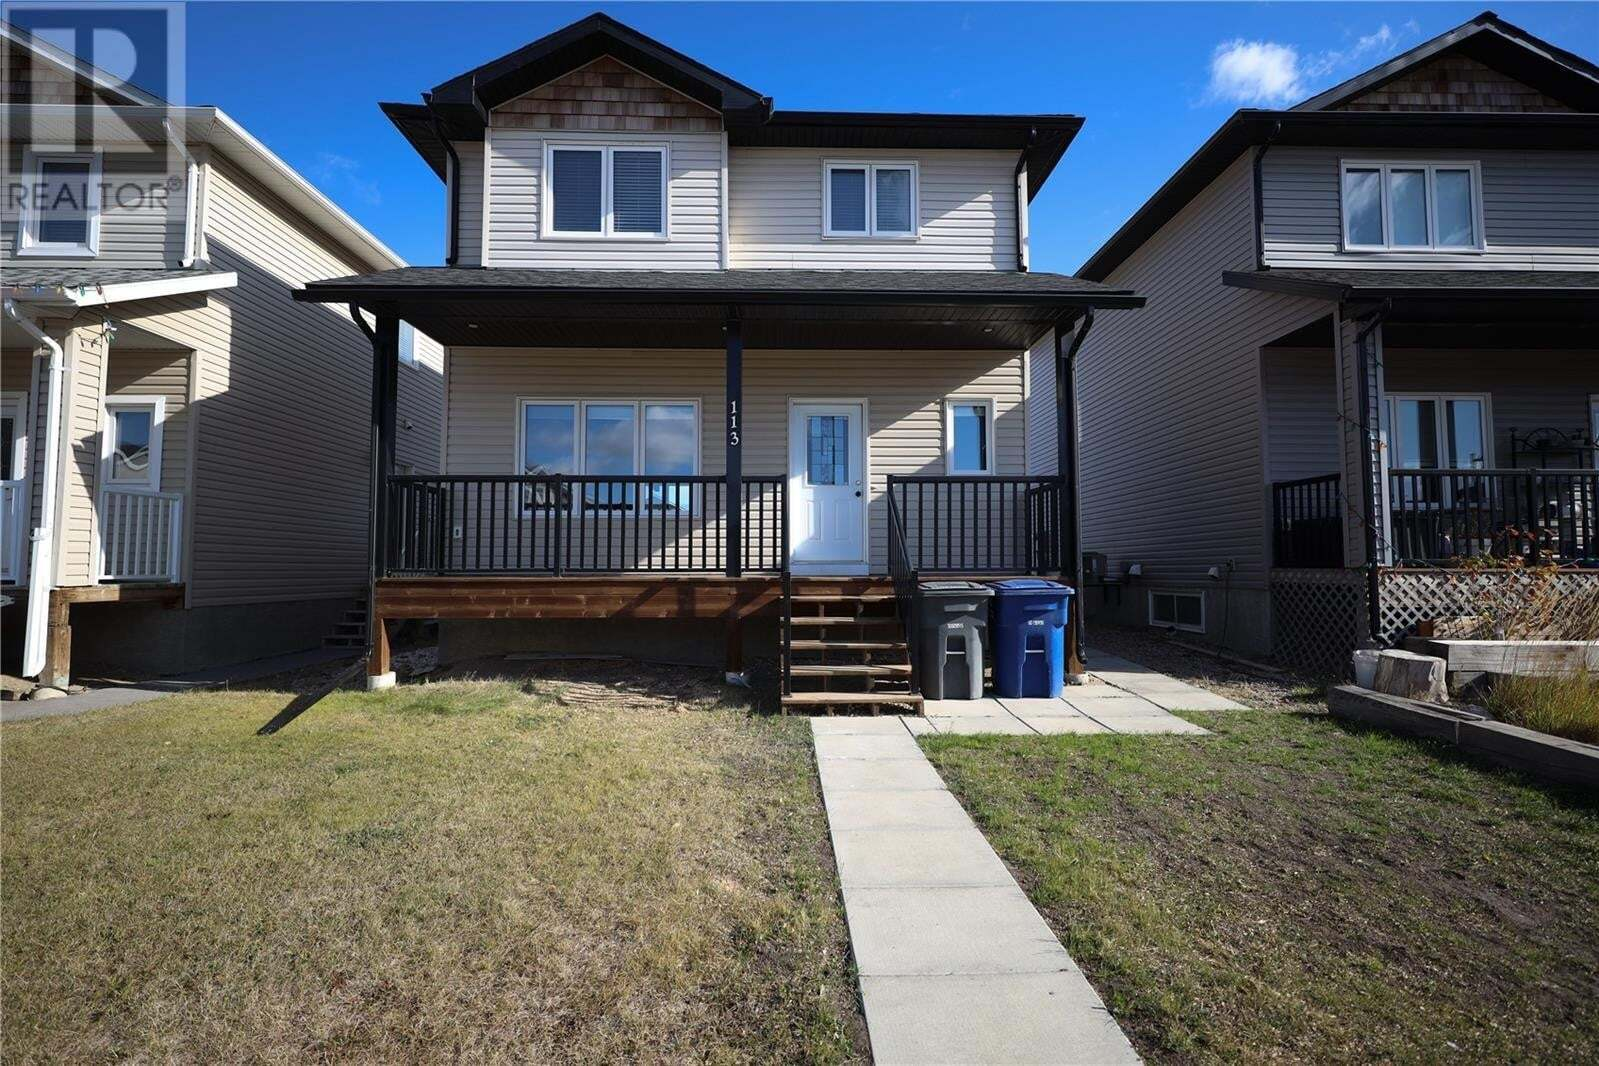 House for sale at 113 Martens Cres Warman Saskatchewan - MLS: SK830718